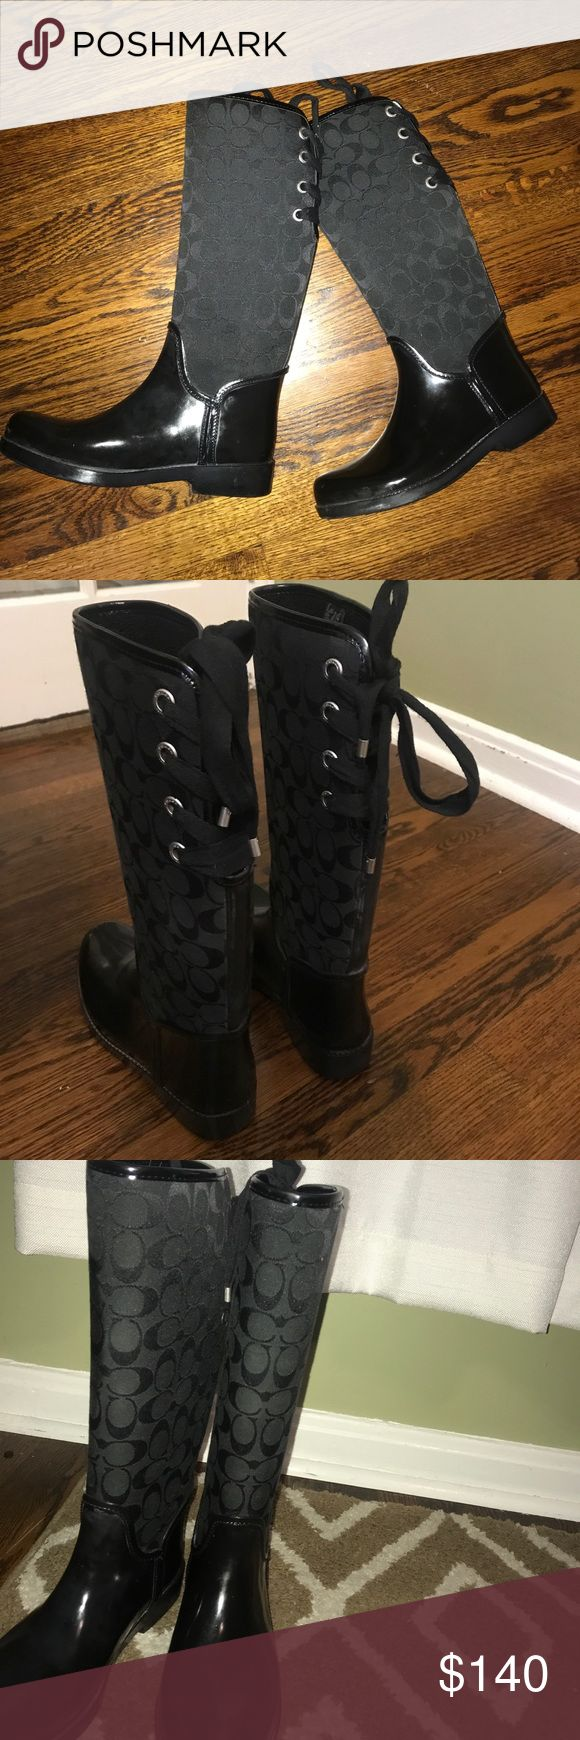 Best 25+ Coach rain boots ideas on Pinterest | White heels